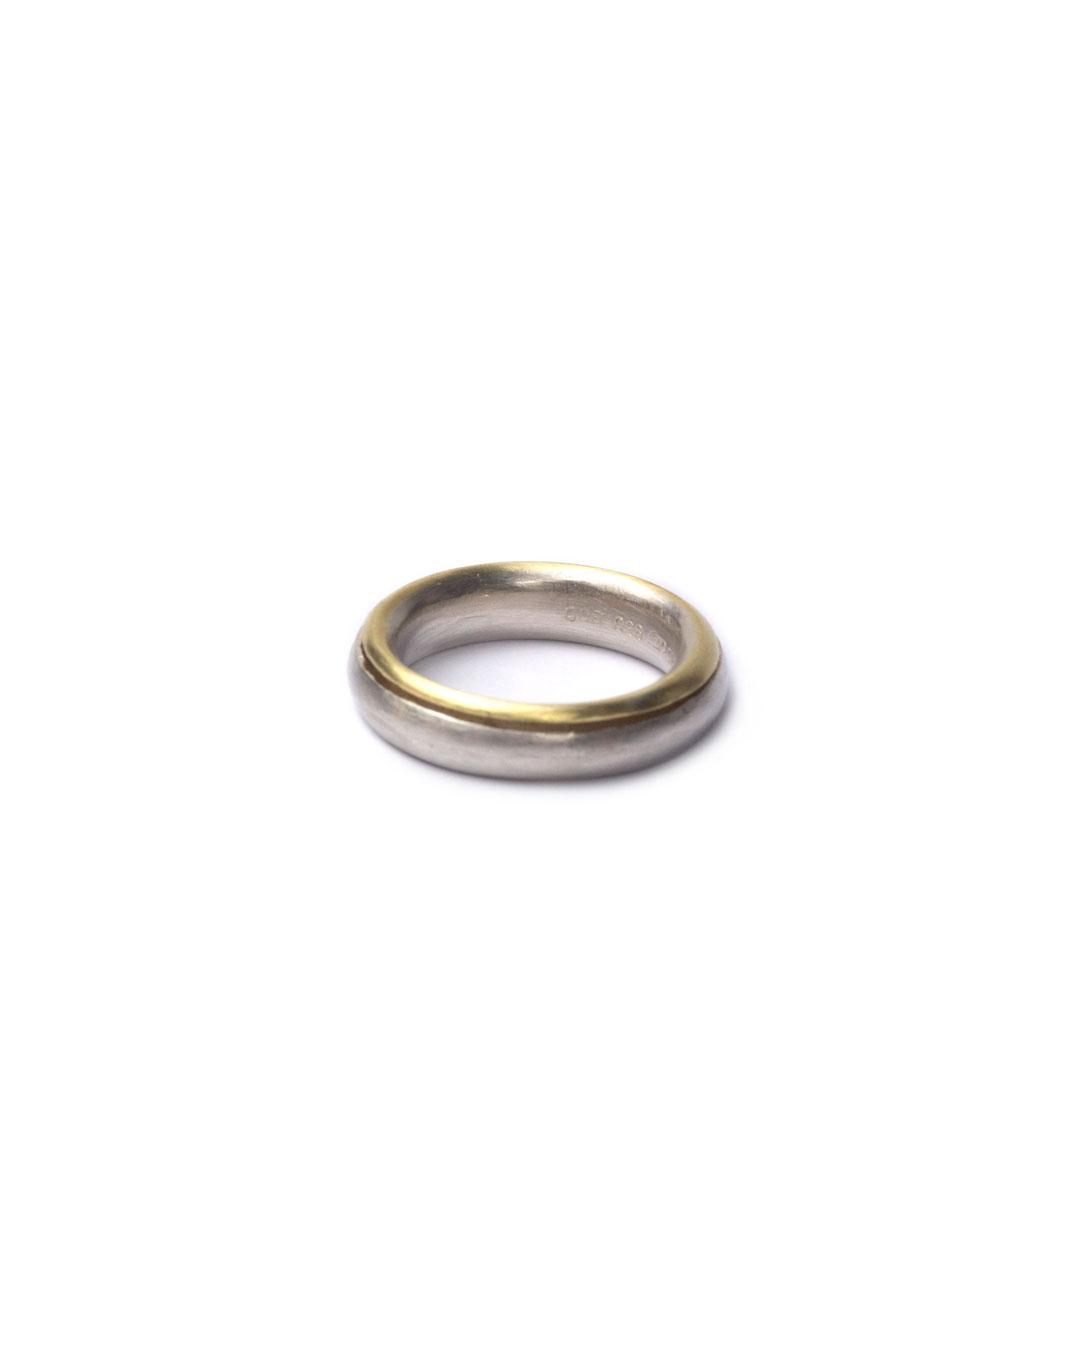 Okinari Kurokawa, untitled, 1998, ring; 970 silver, 900 gold, ø 22 x 5 mm, €950